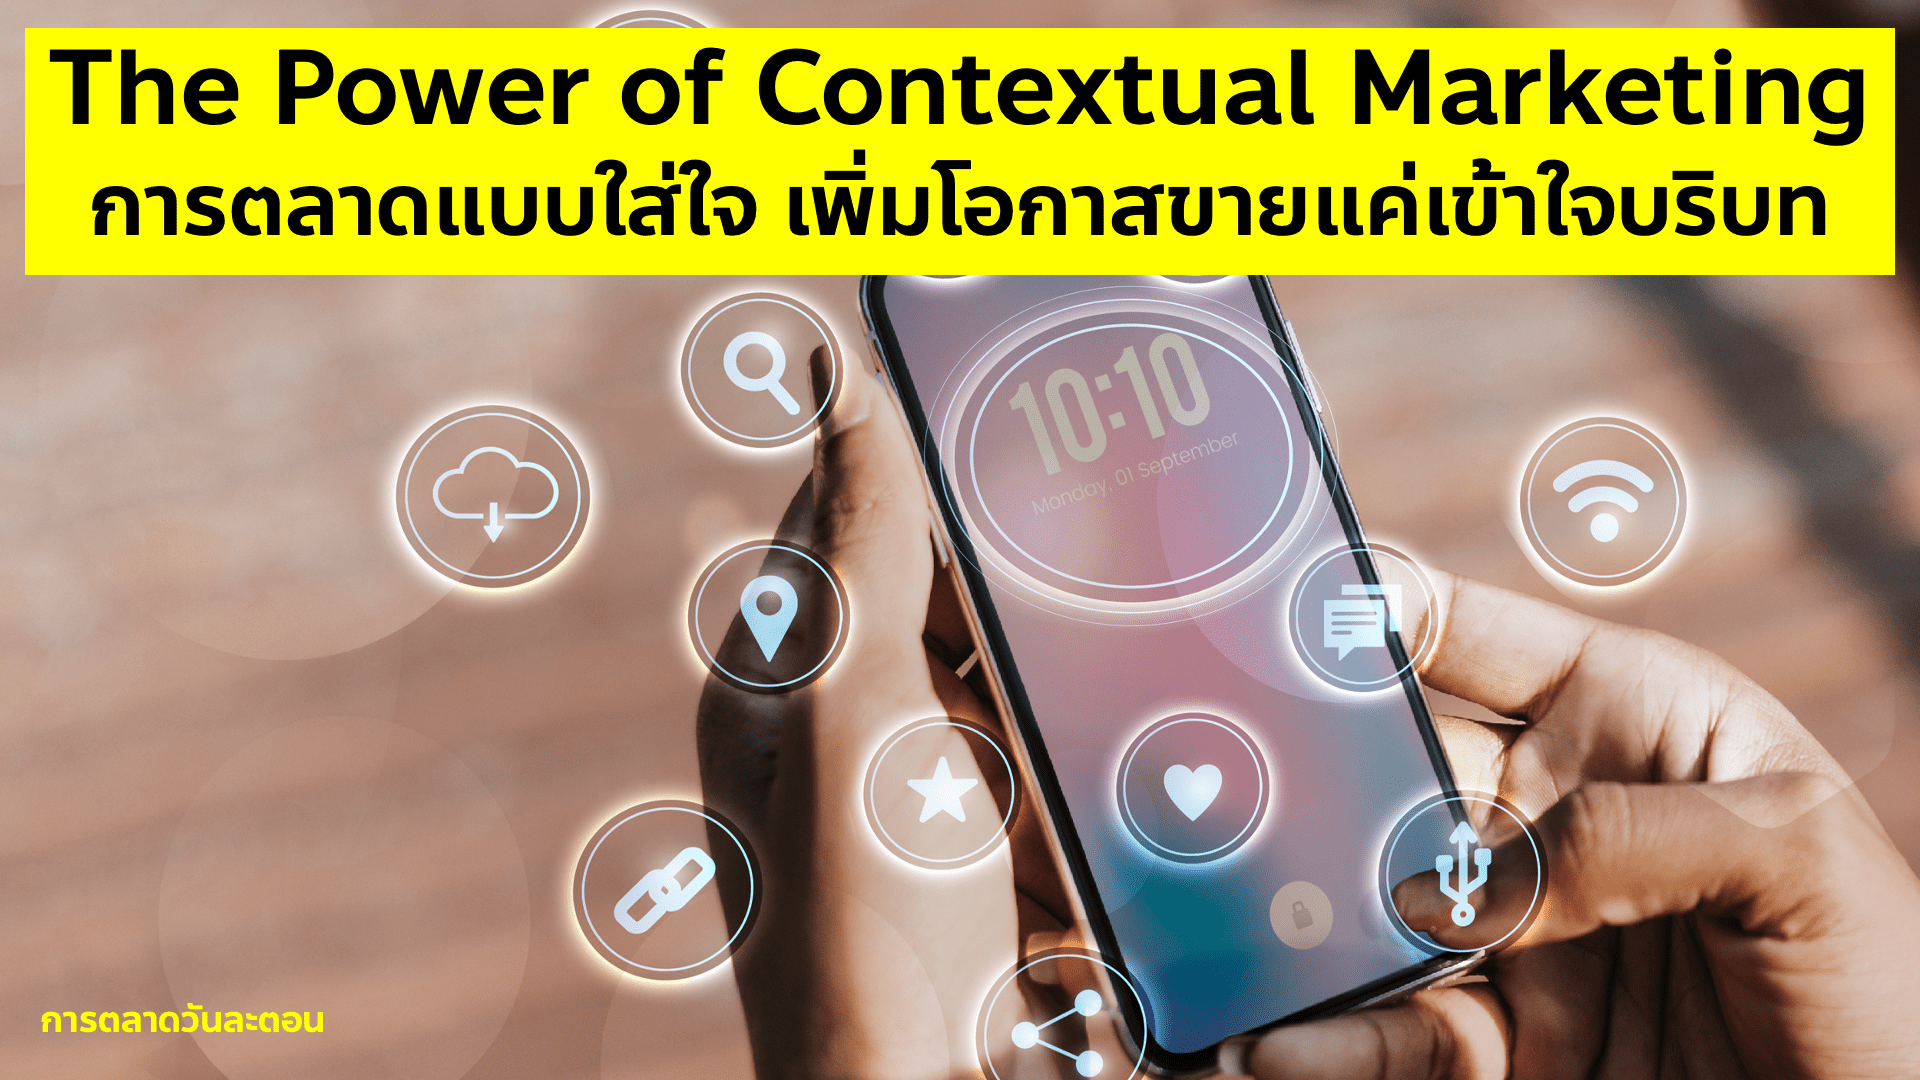 Contextual Marketing การตลาดแบบใส่ใจ ปรับตัวตามบริบทแบบ Real-time